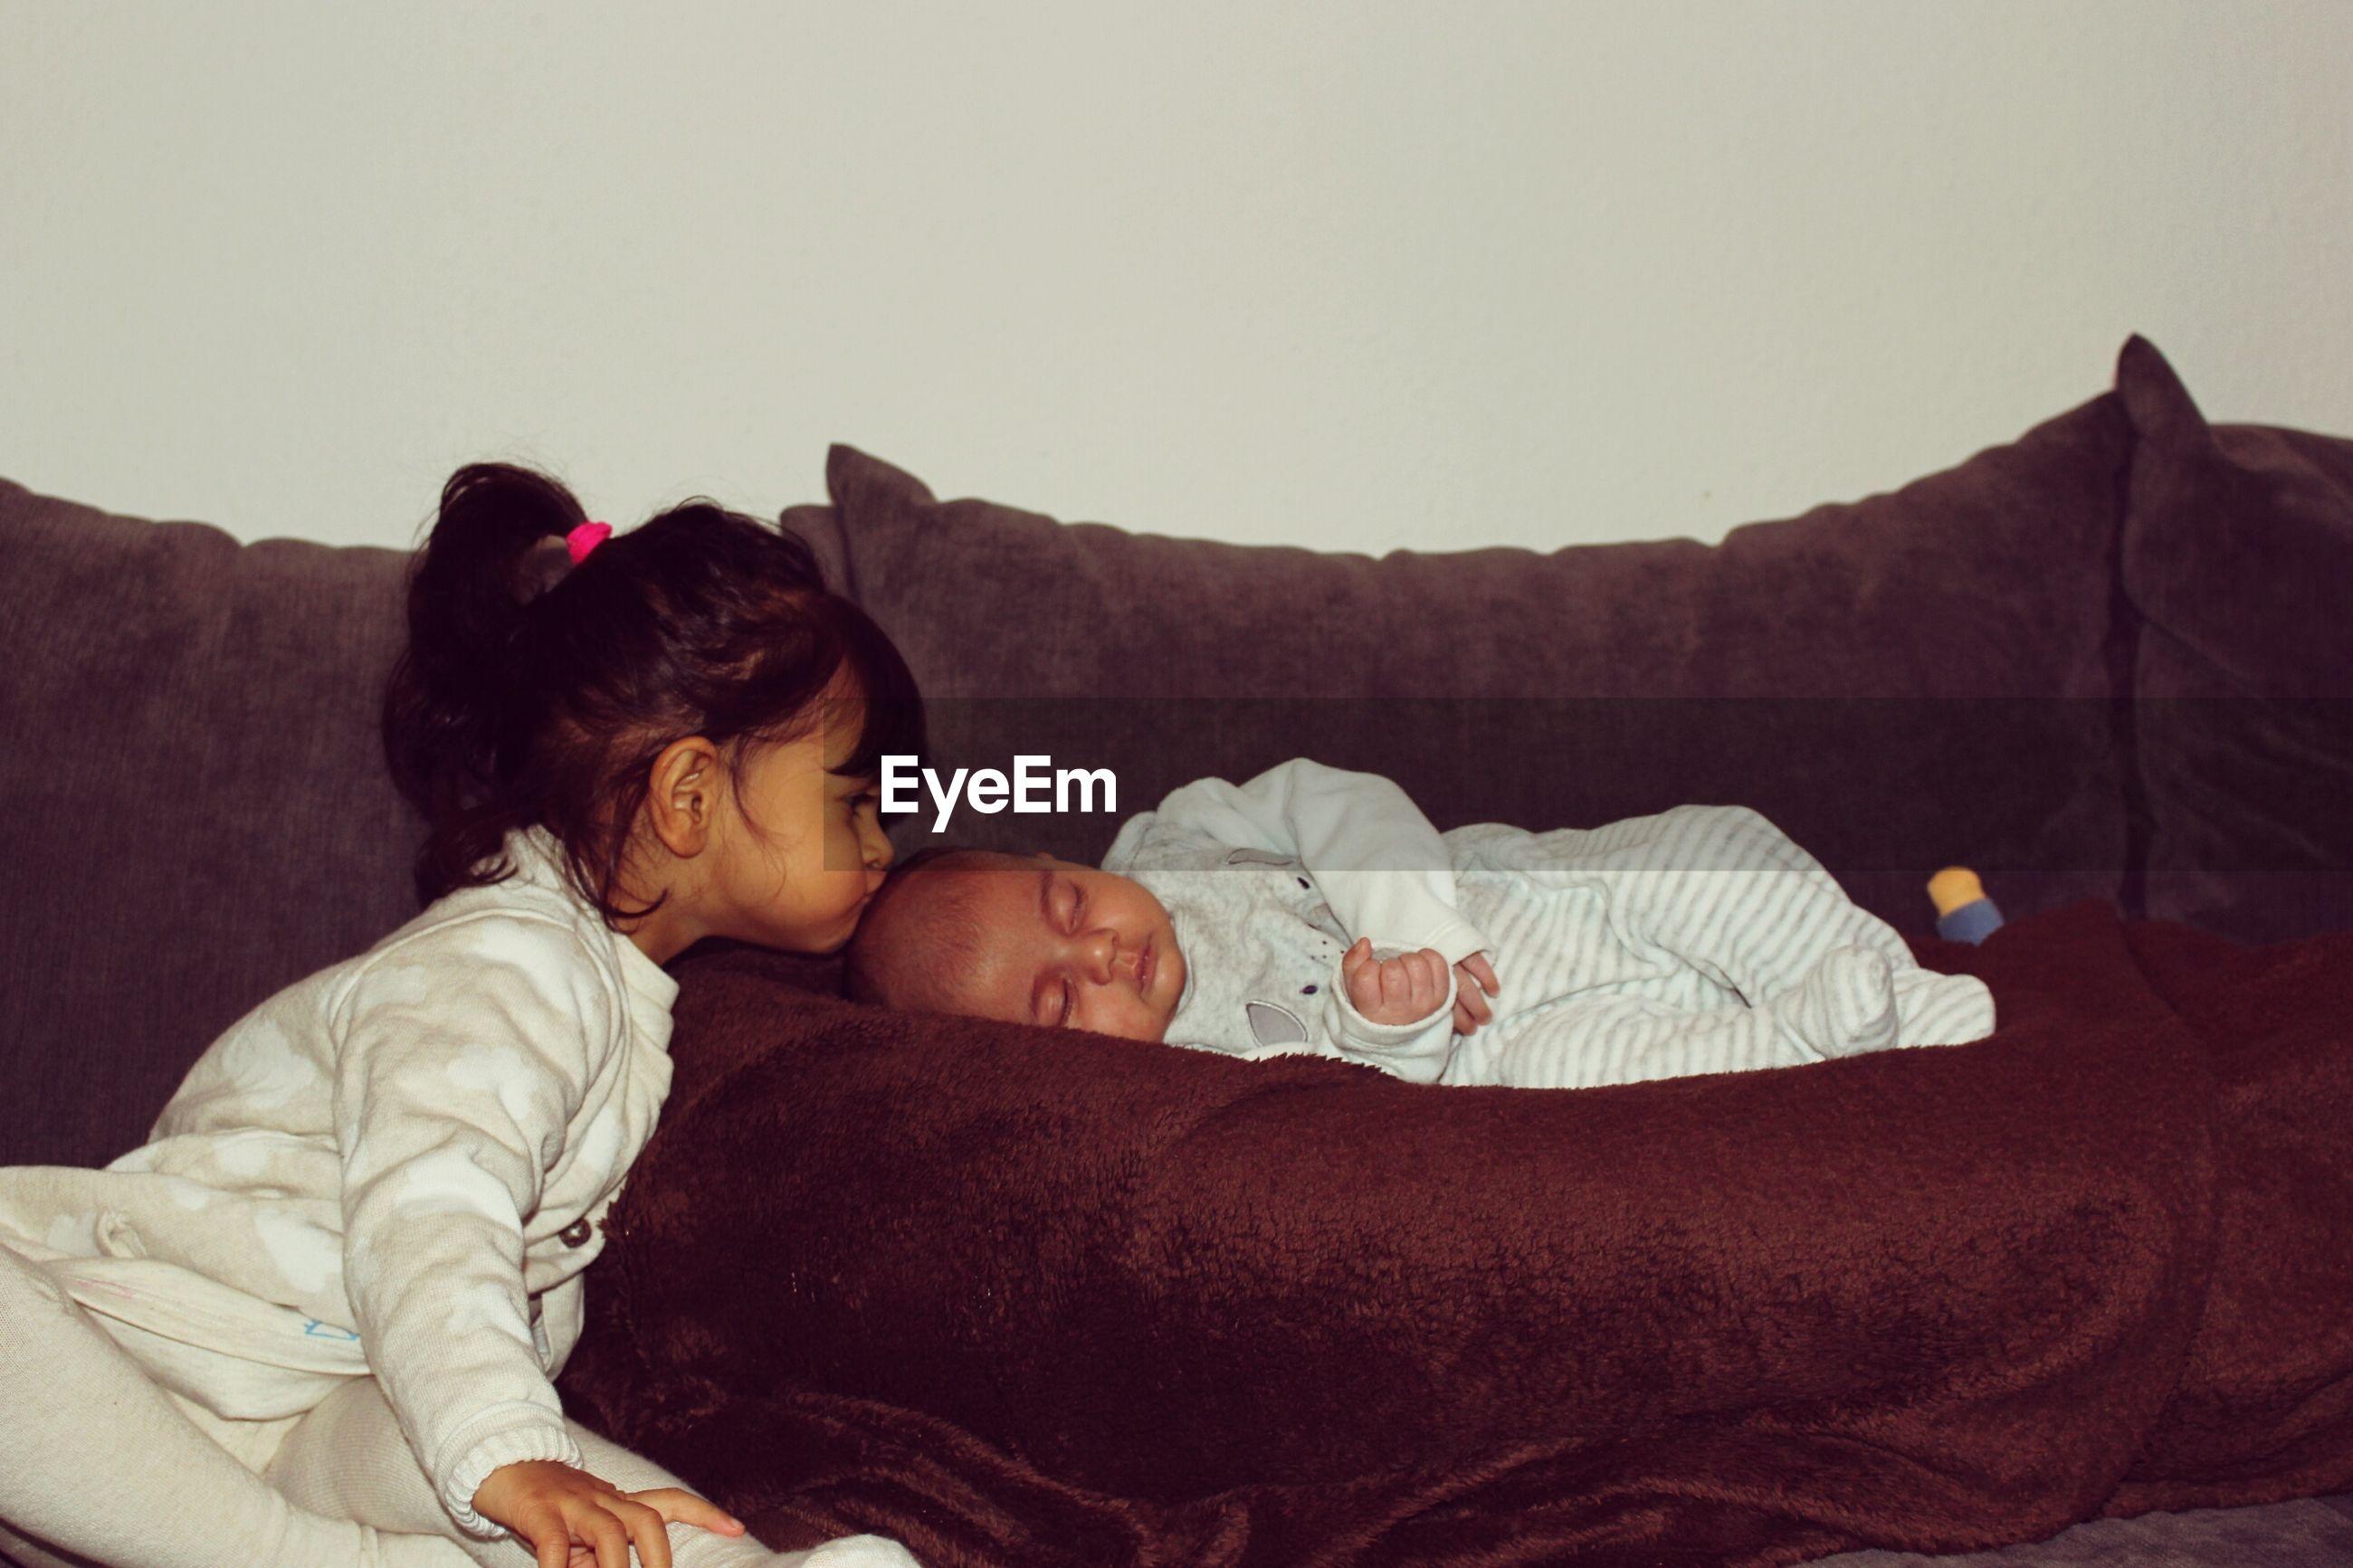 Sister kissing sleeping brother on sofa at home